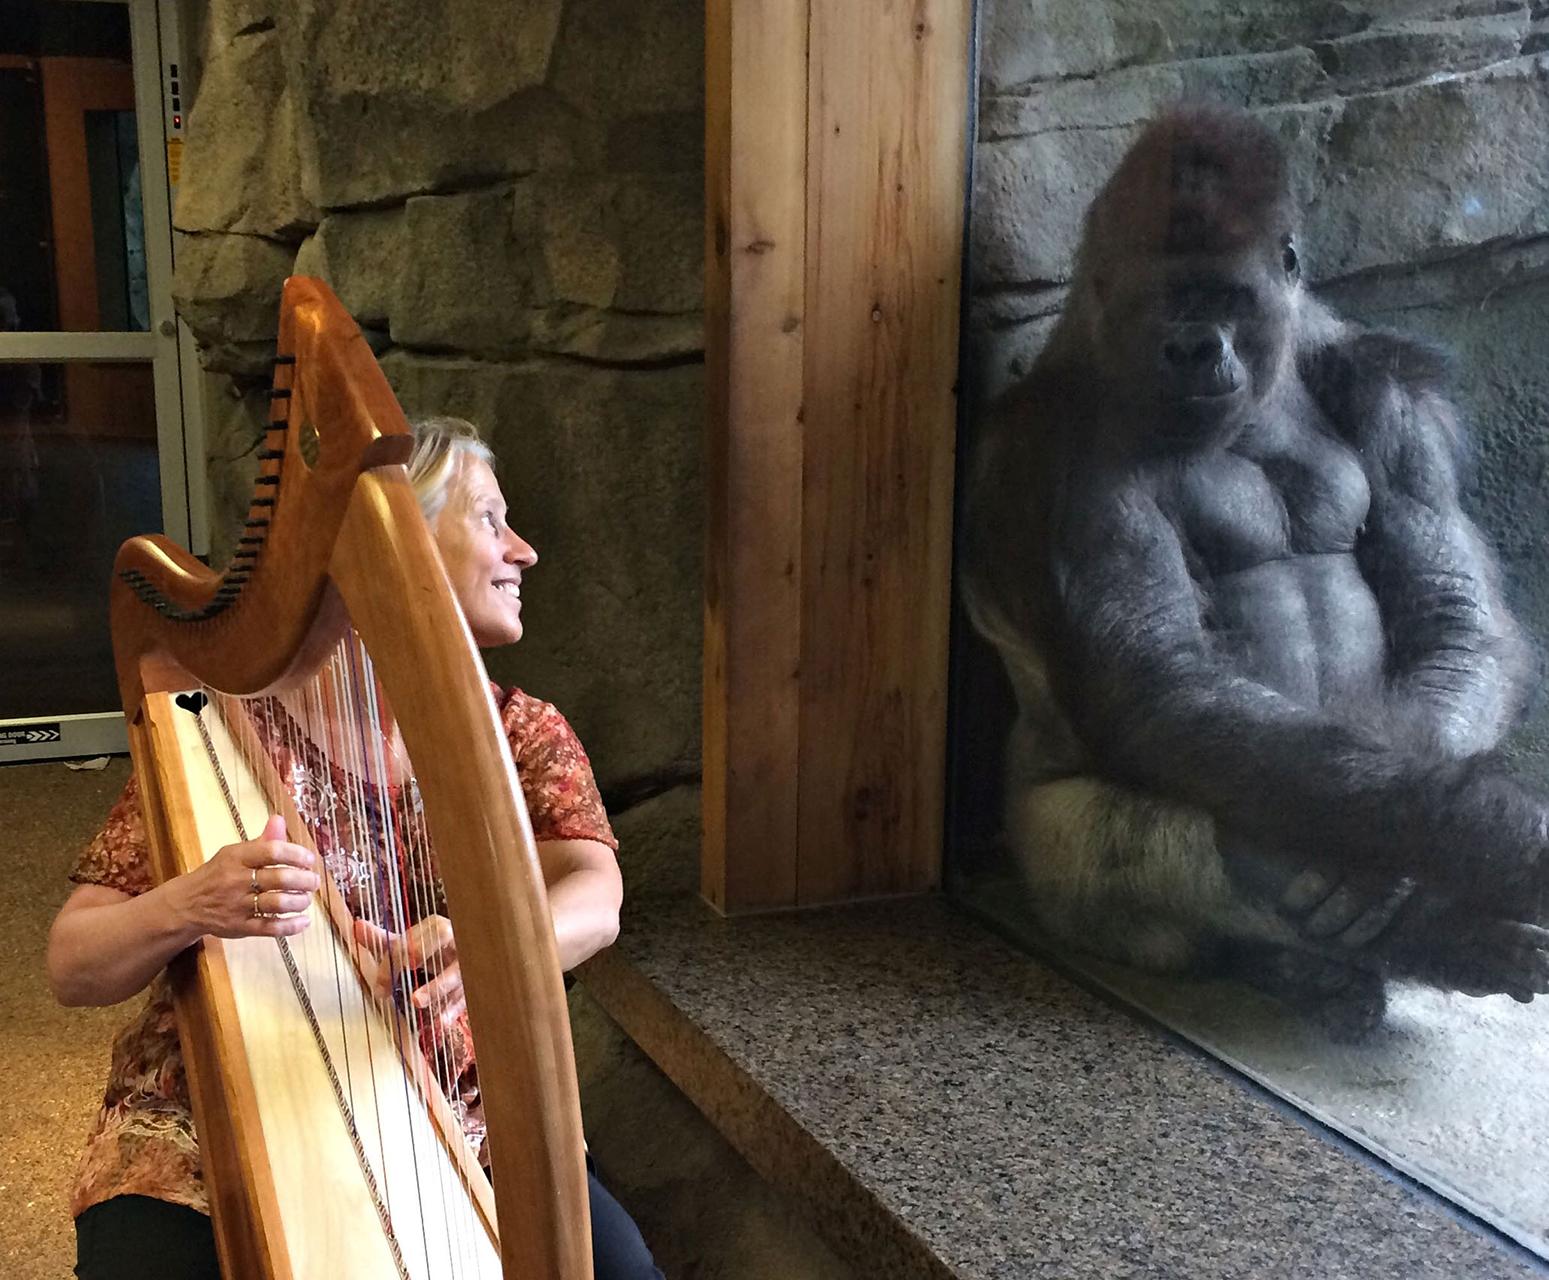 Terri Tacheny playing the harp for a goriilla